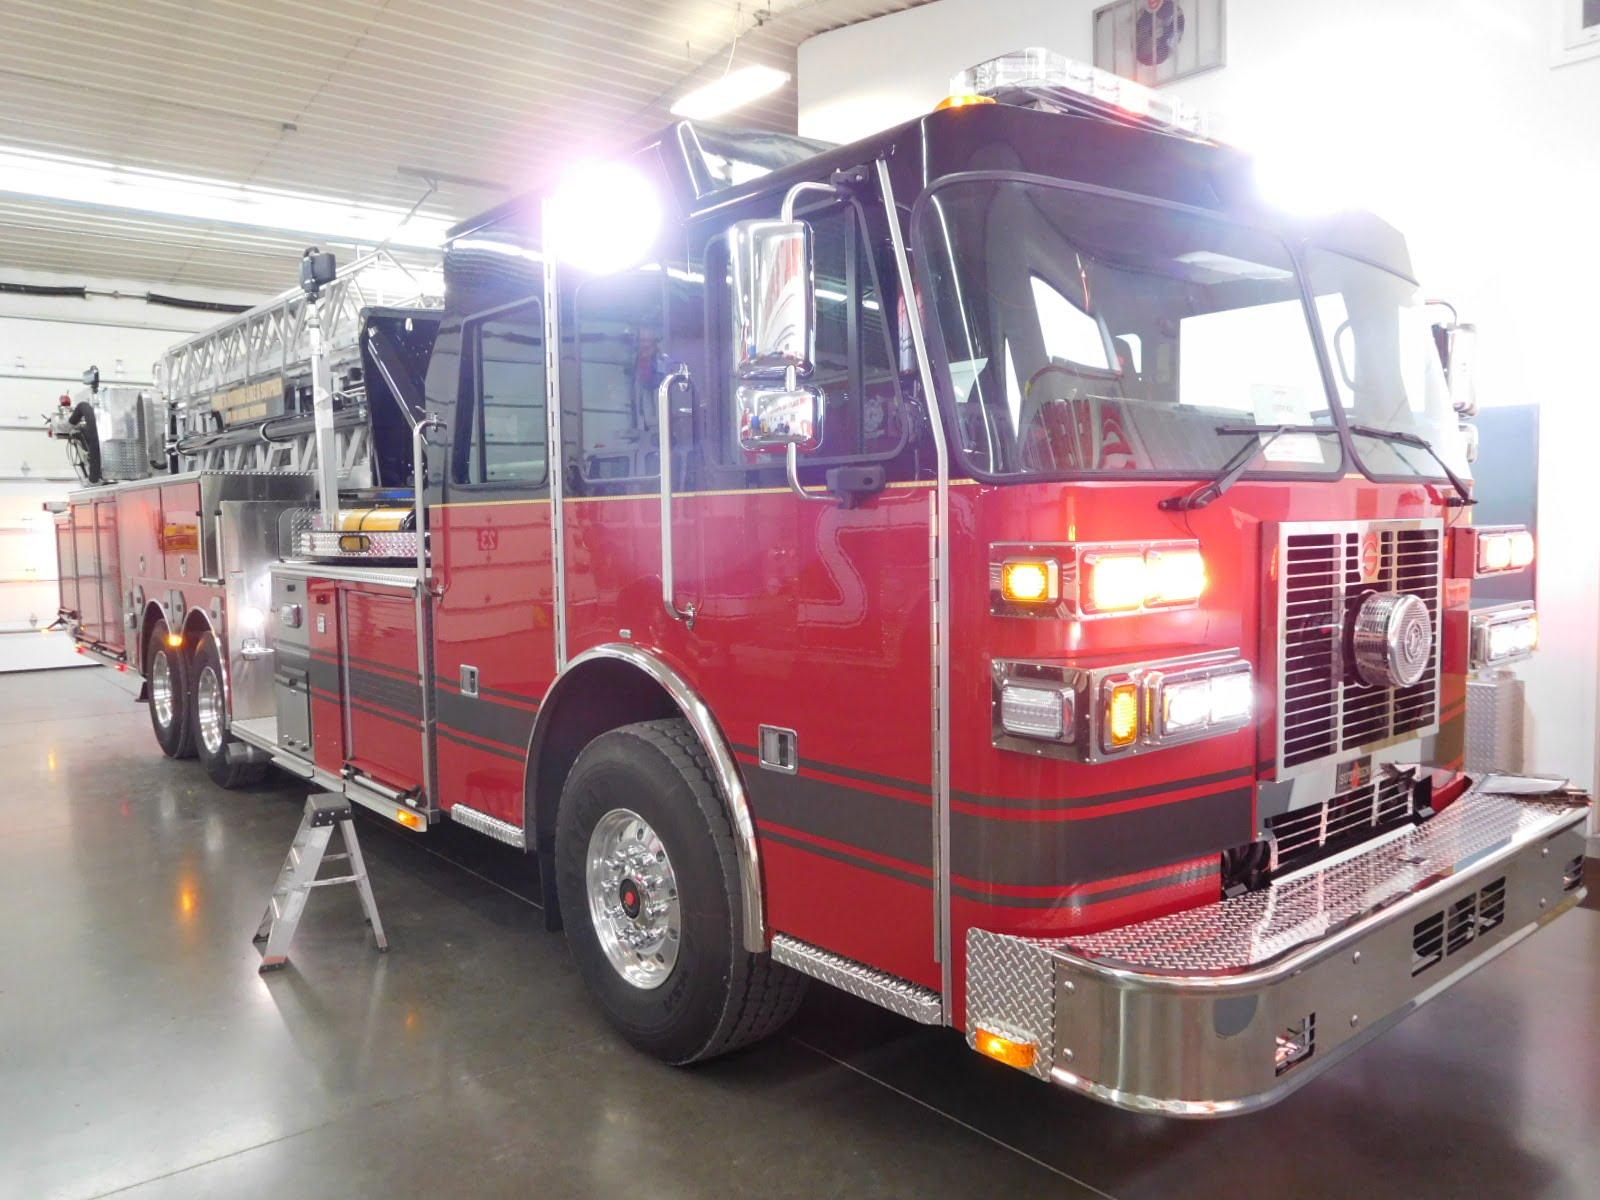 Savannah Fire Department